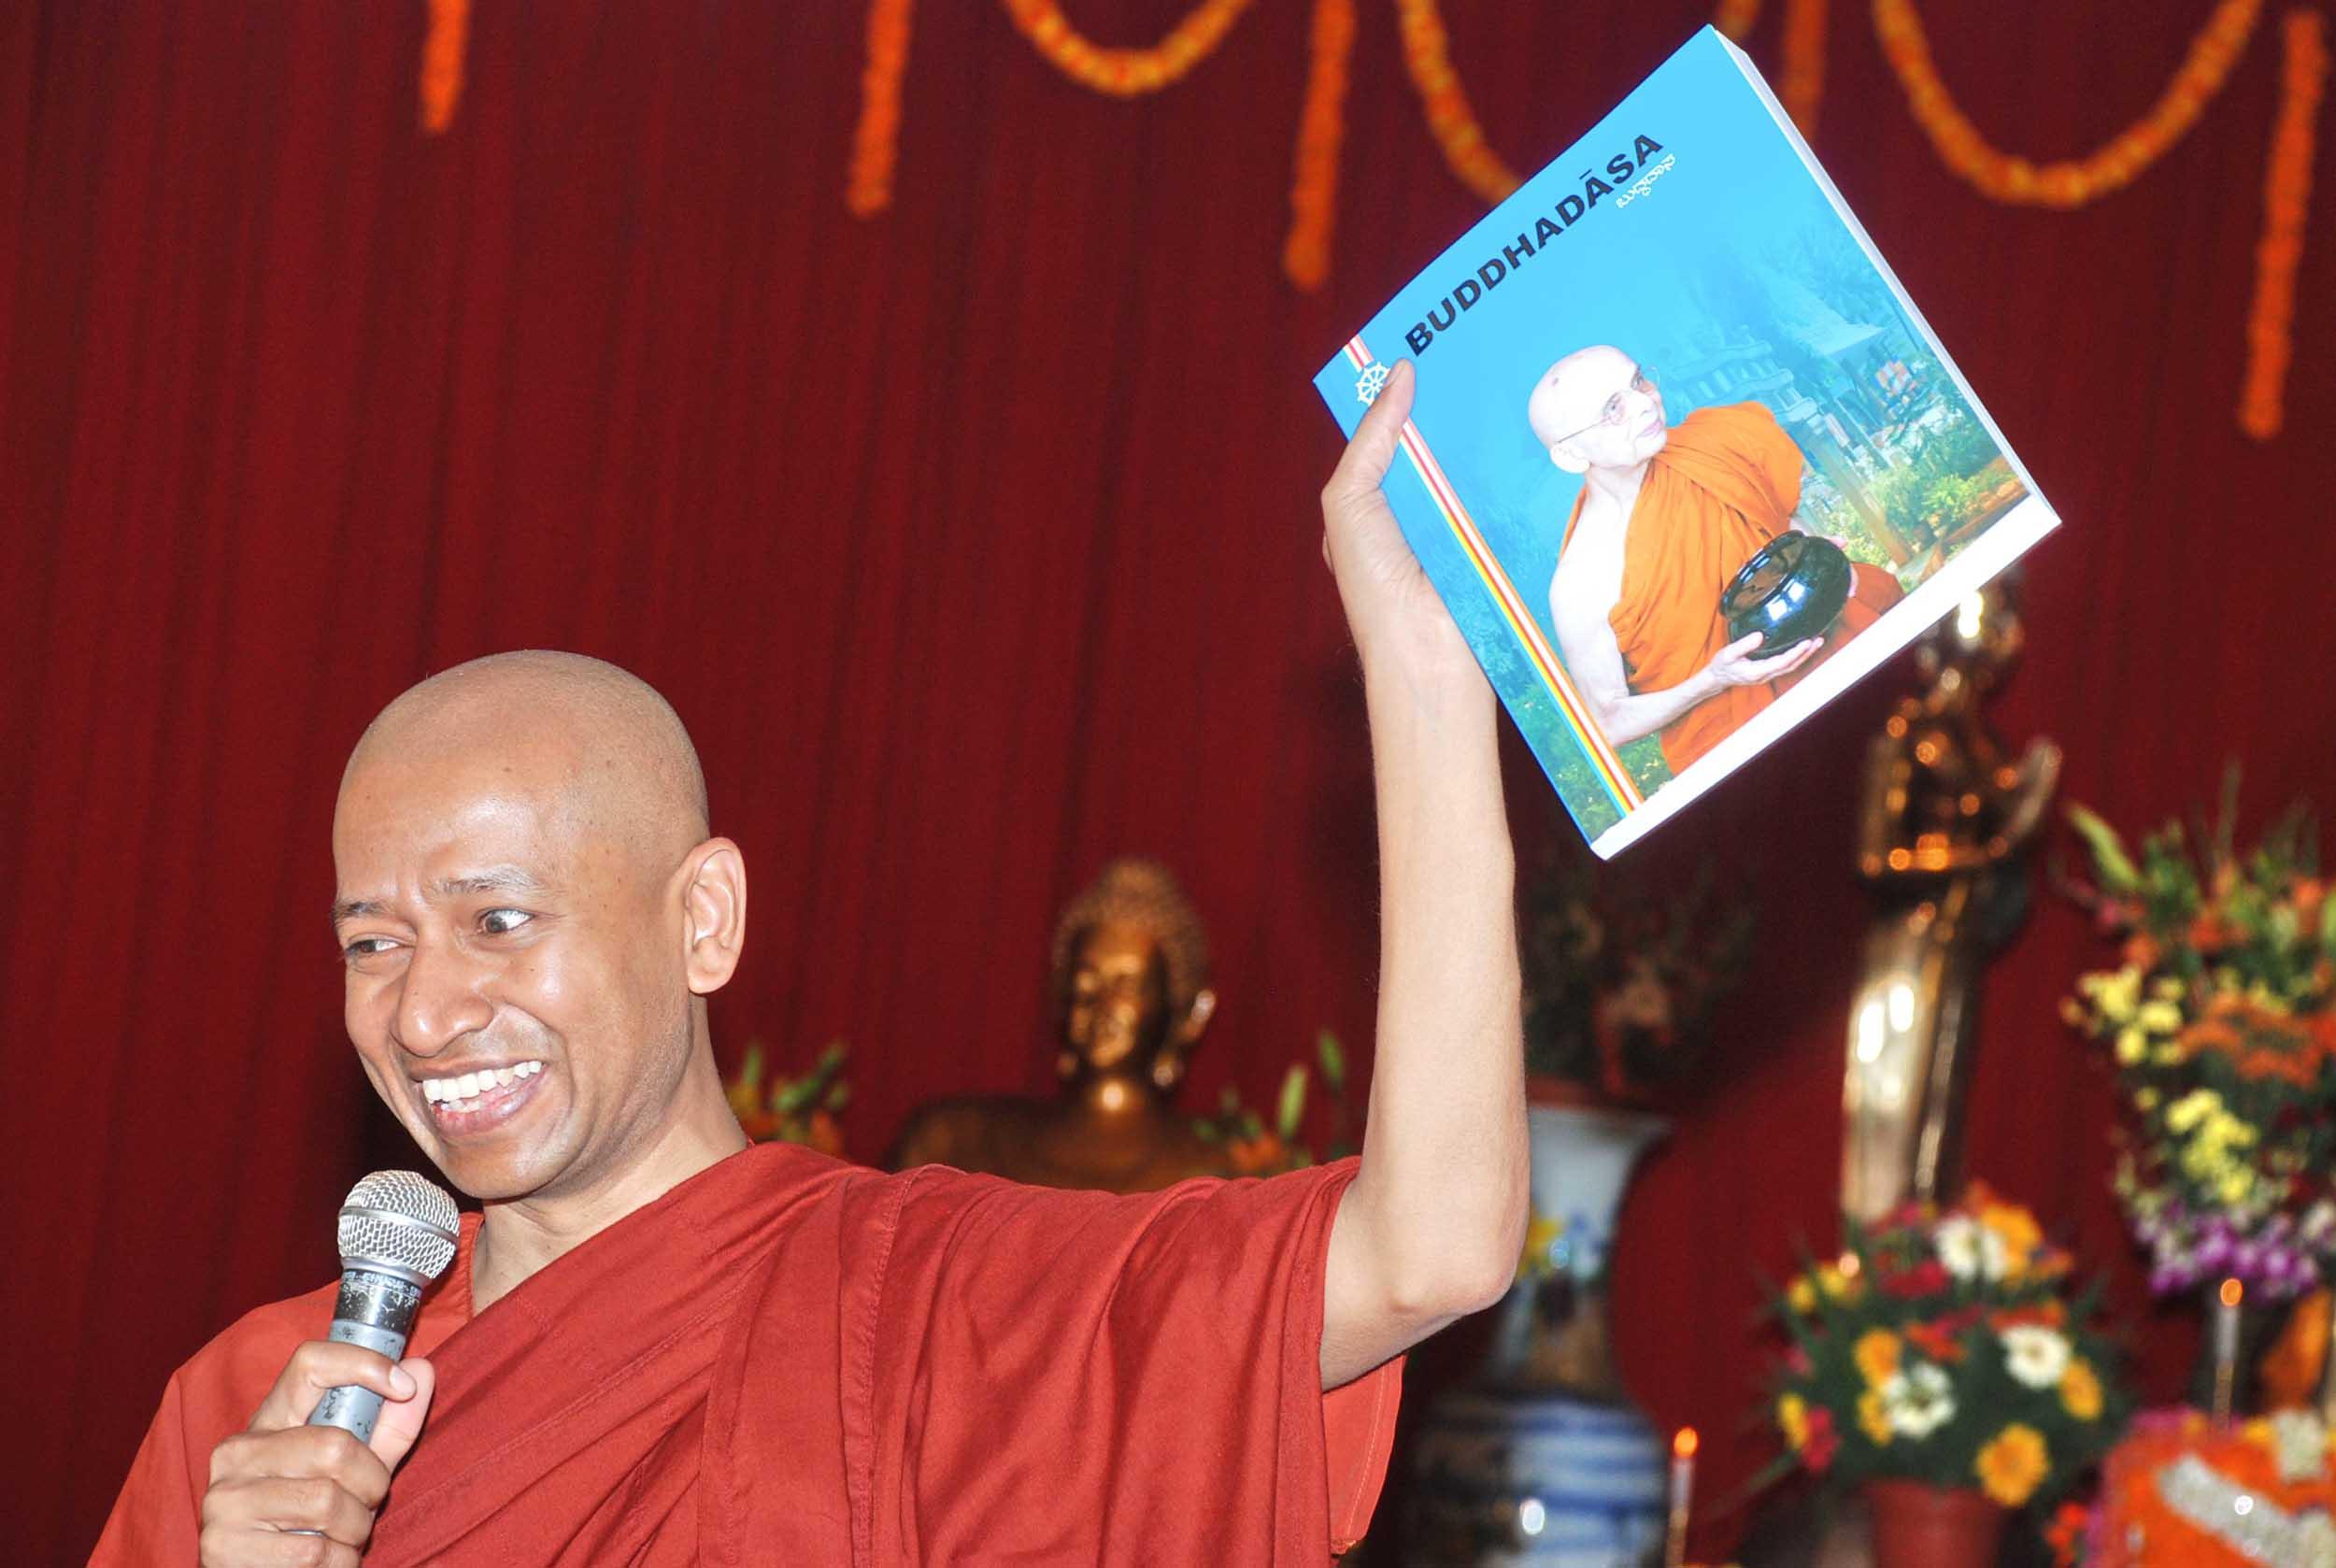 dhammapada-festival-mahabodhi-2011 (23)